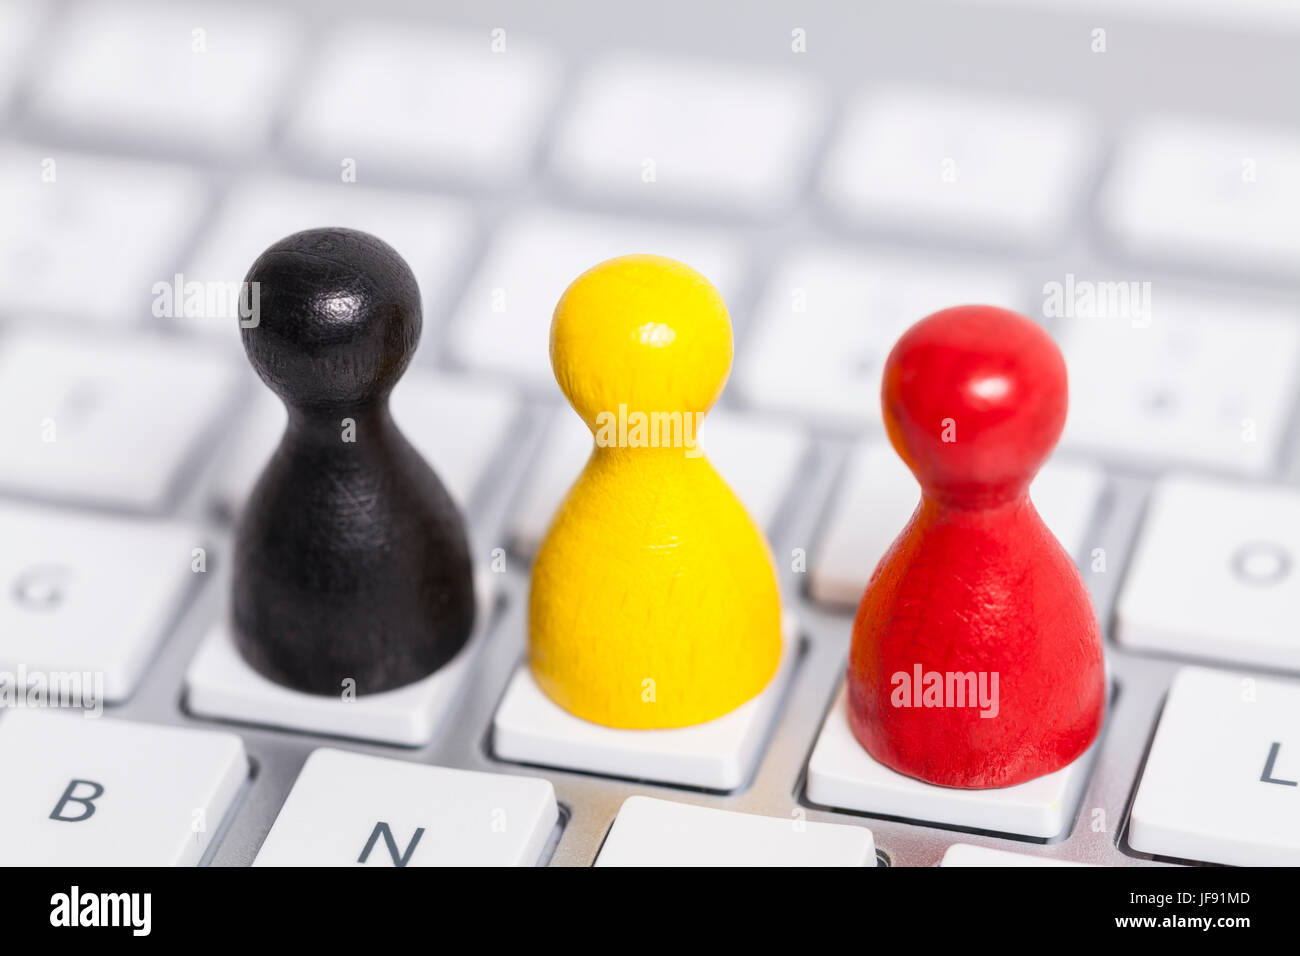 German flag figures on keyboard - Stock Image